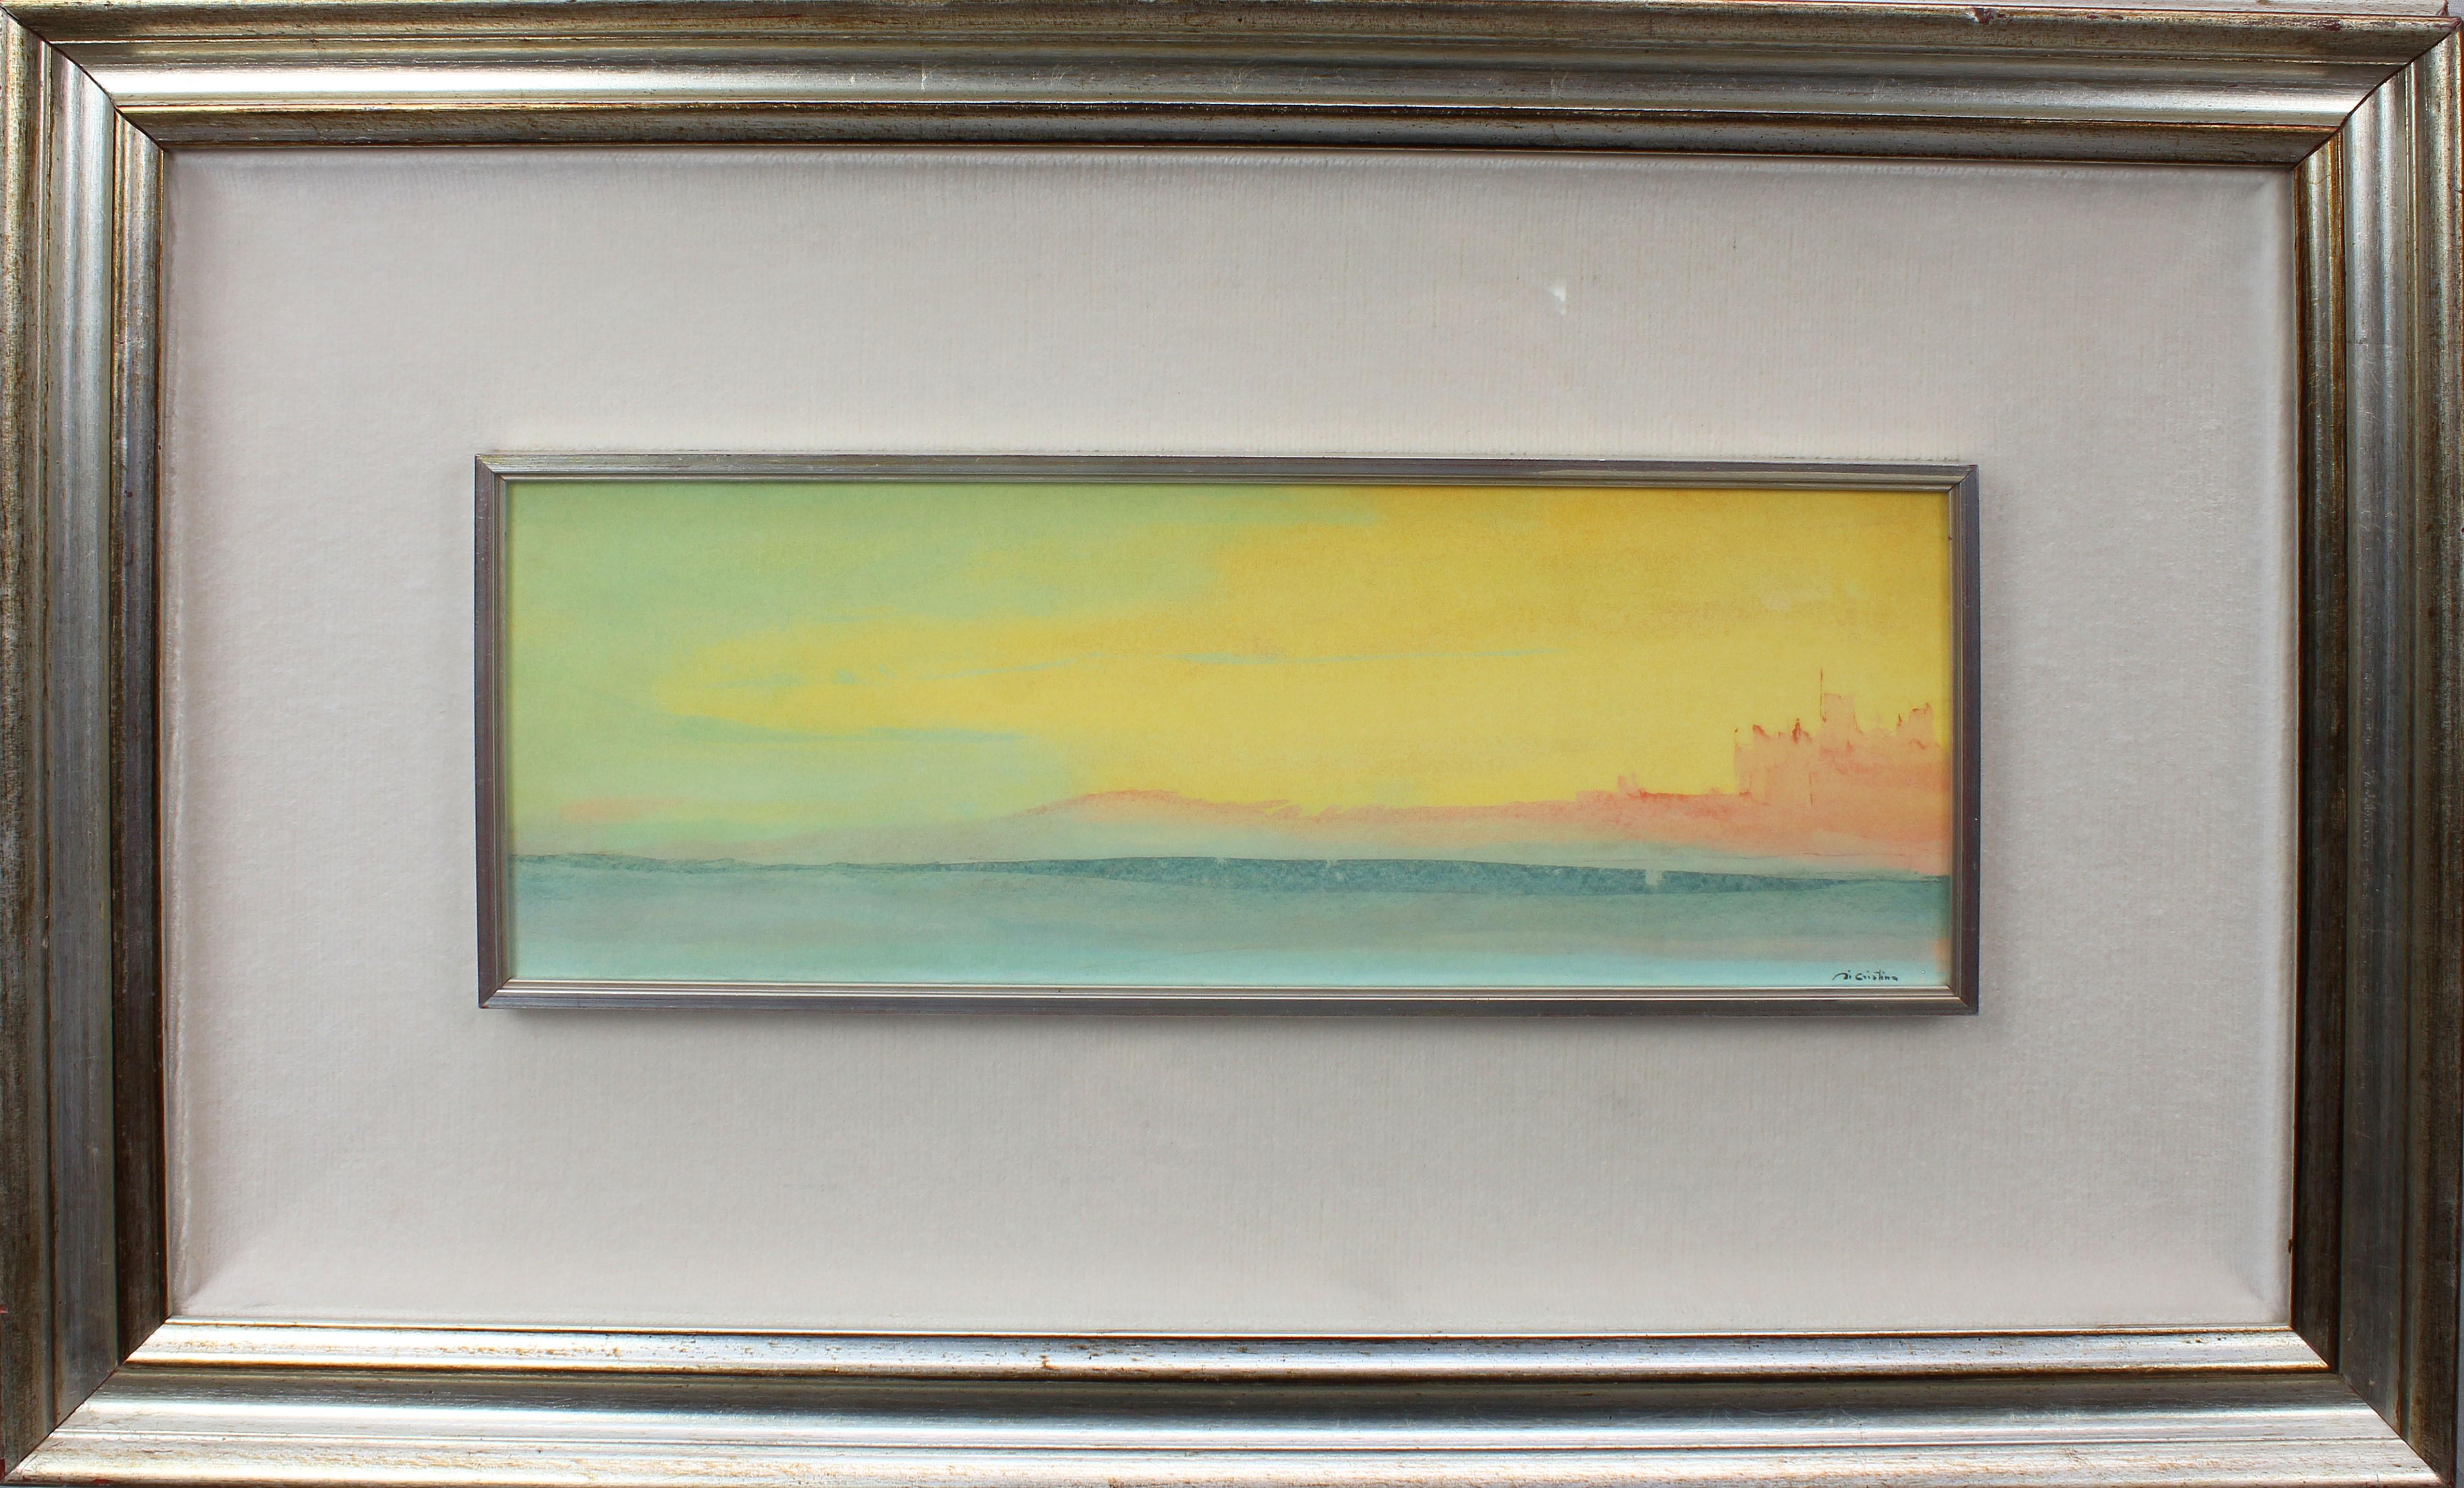 Lot 30 - Paesaggio, a firma Di Cristina, tecnica mista, cm. 35x17